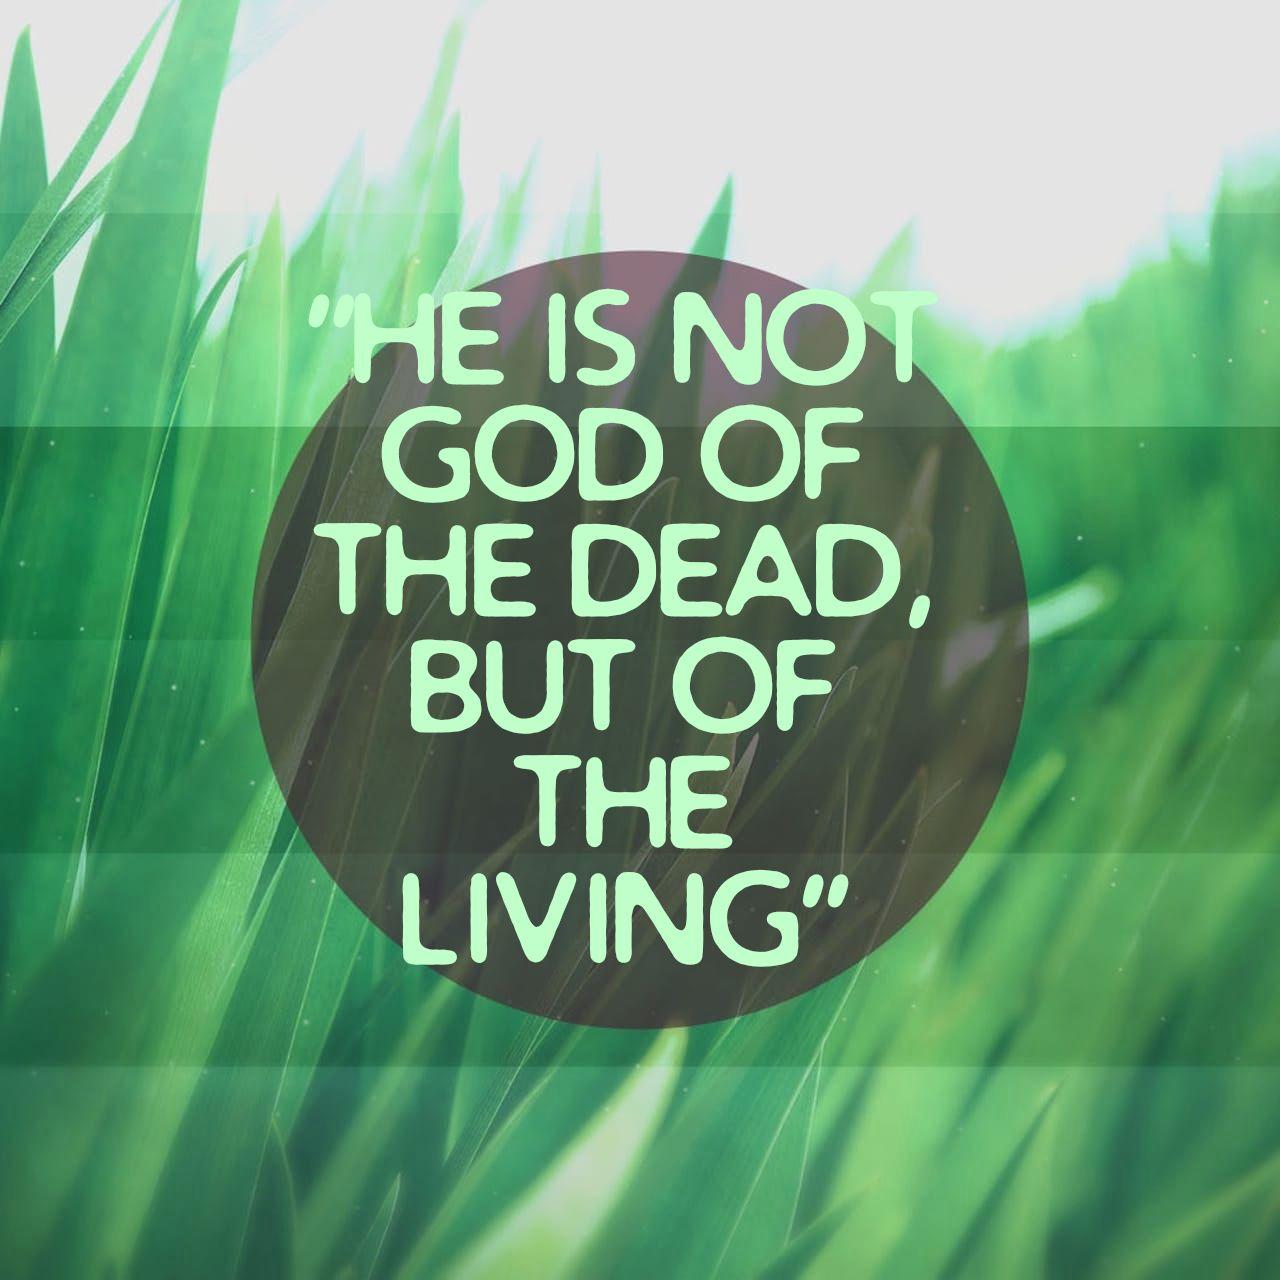 Daily Bible Reading: Luke 20:27-47